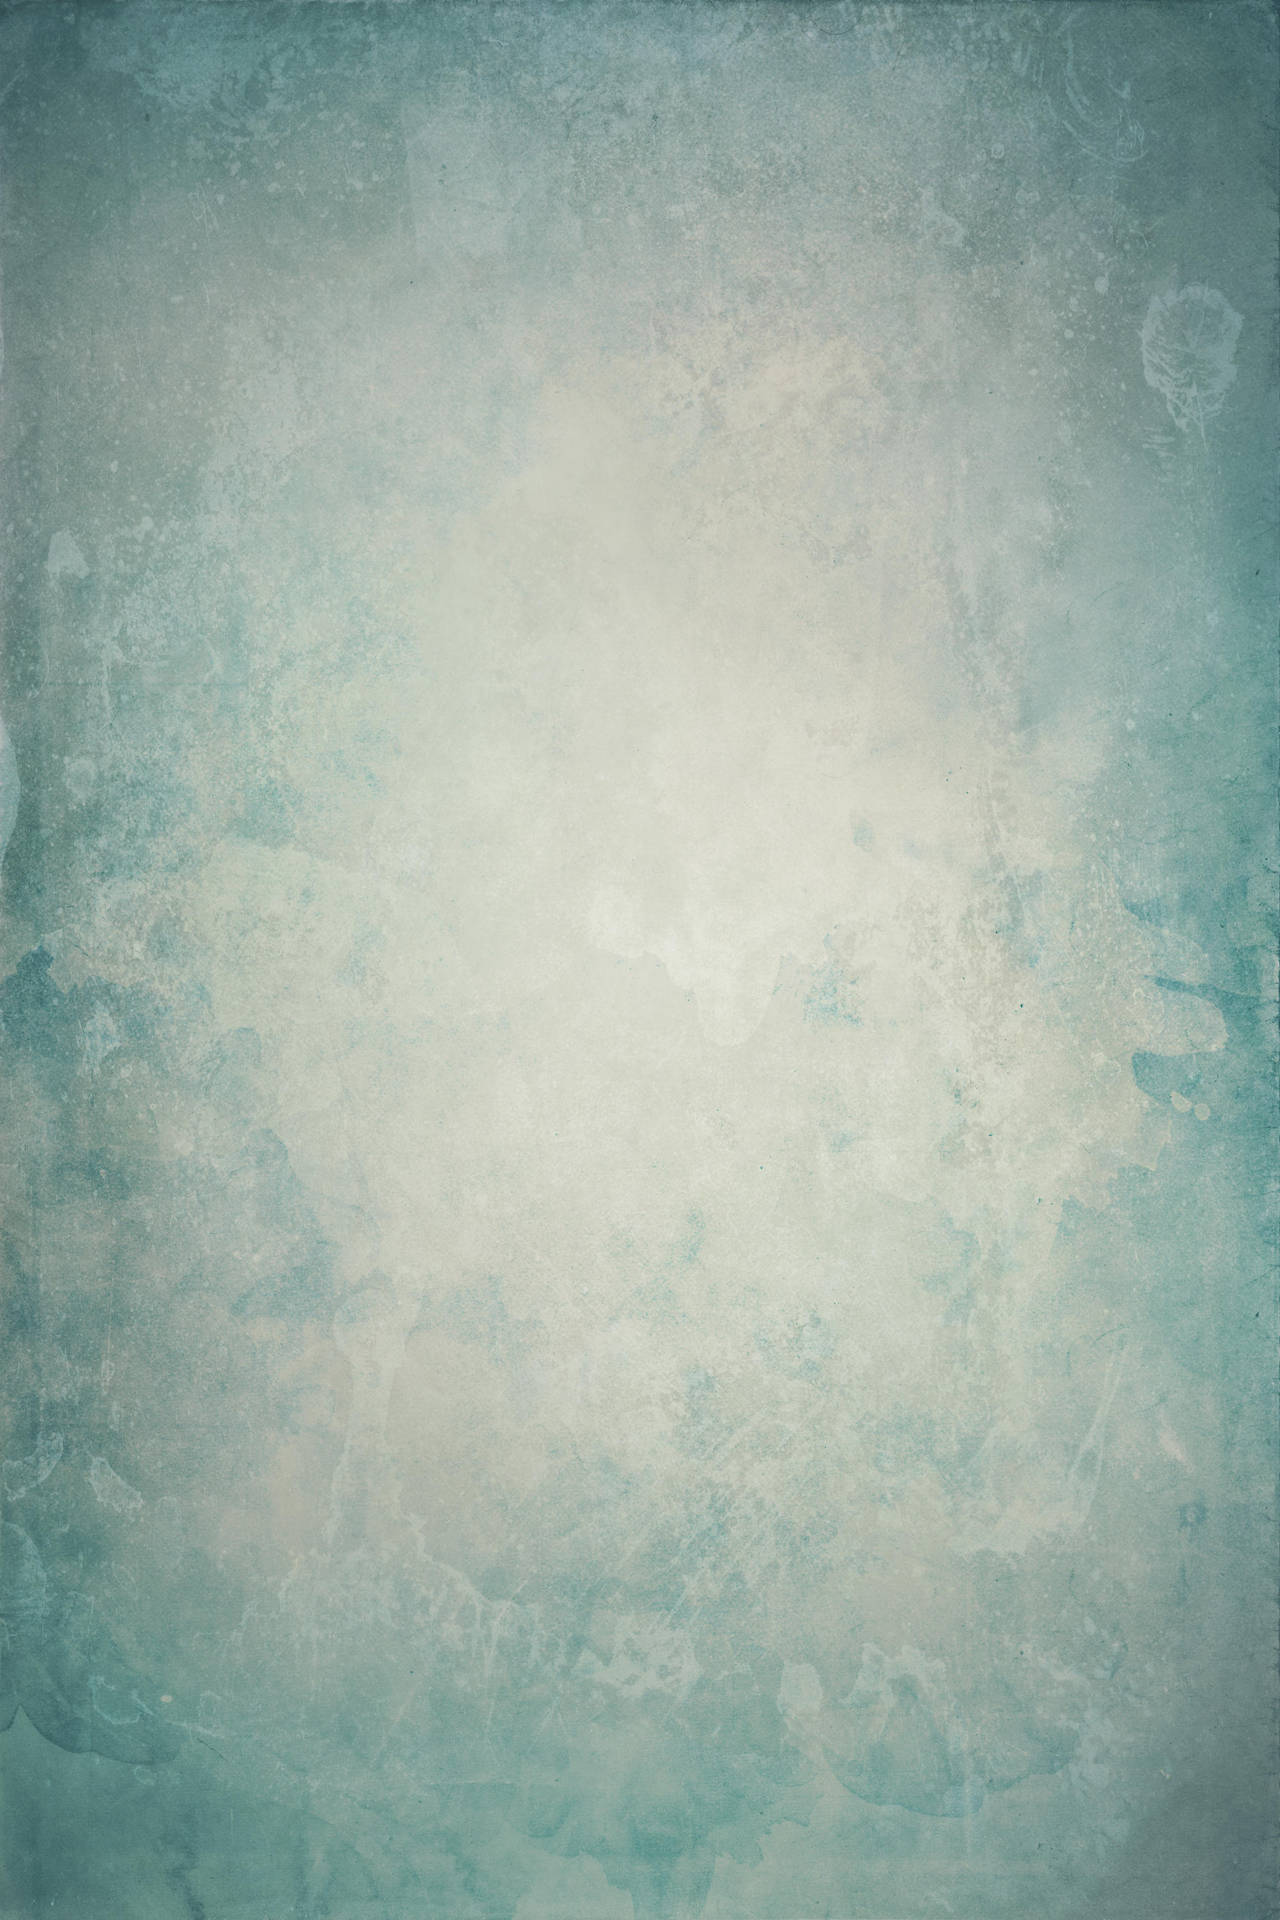 Blue Grunge II by darkrose42-stock